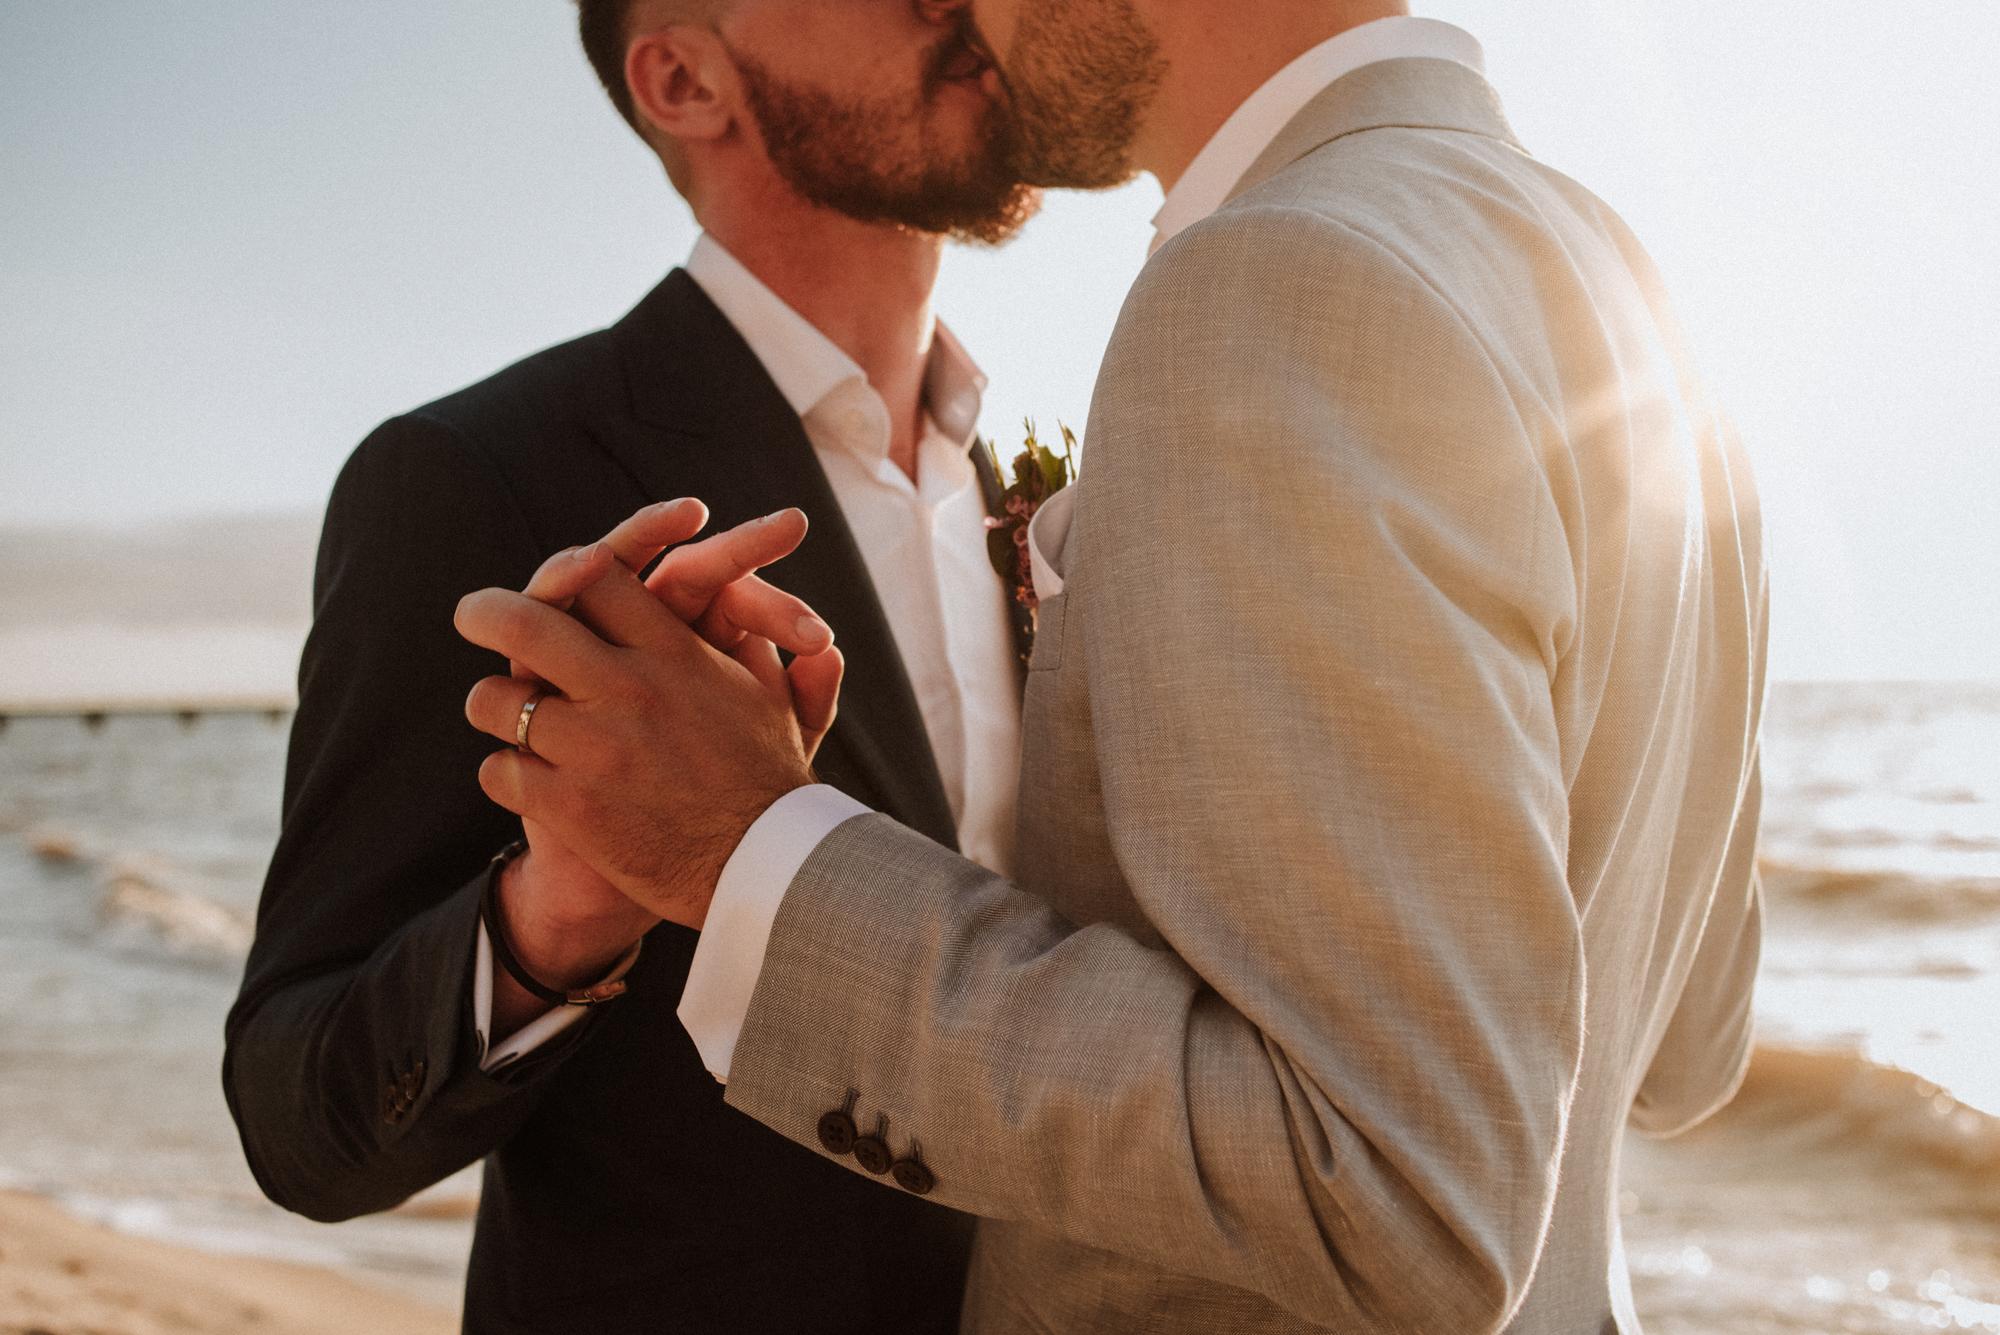 jessica-howard-photography-sean-alessandro-wedding-day-web-360.jpg